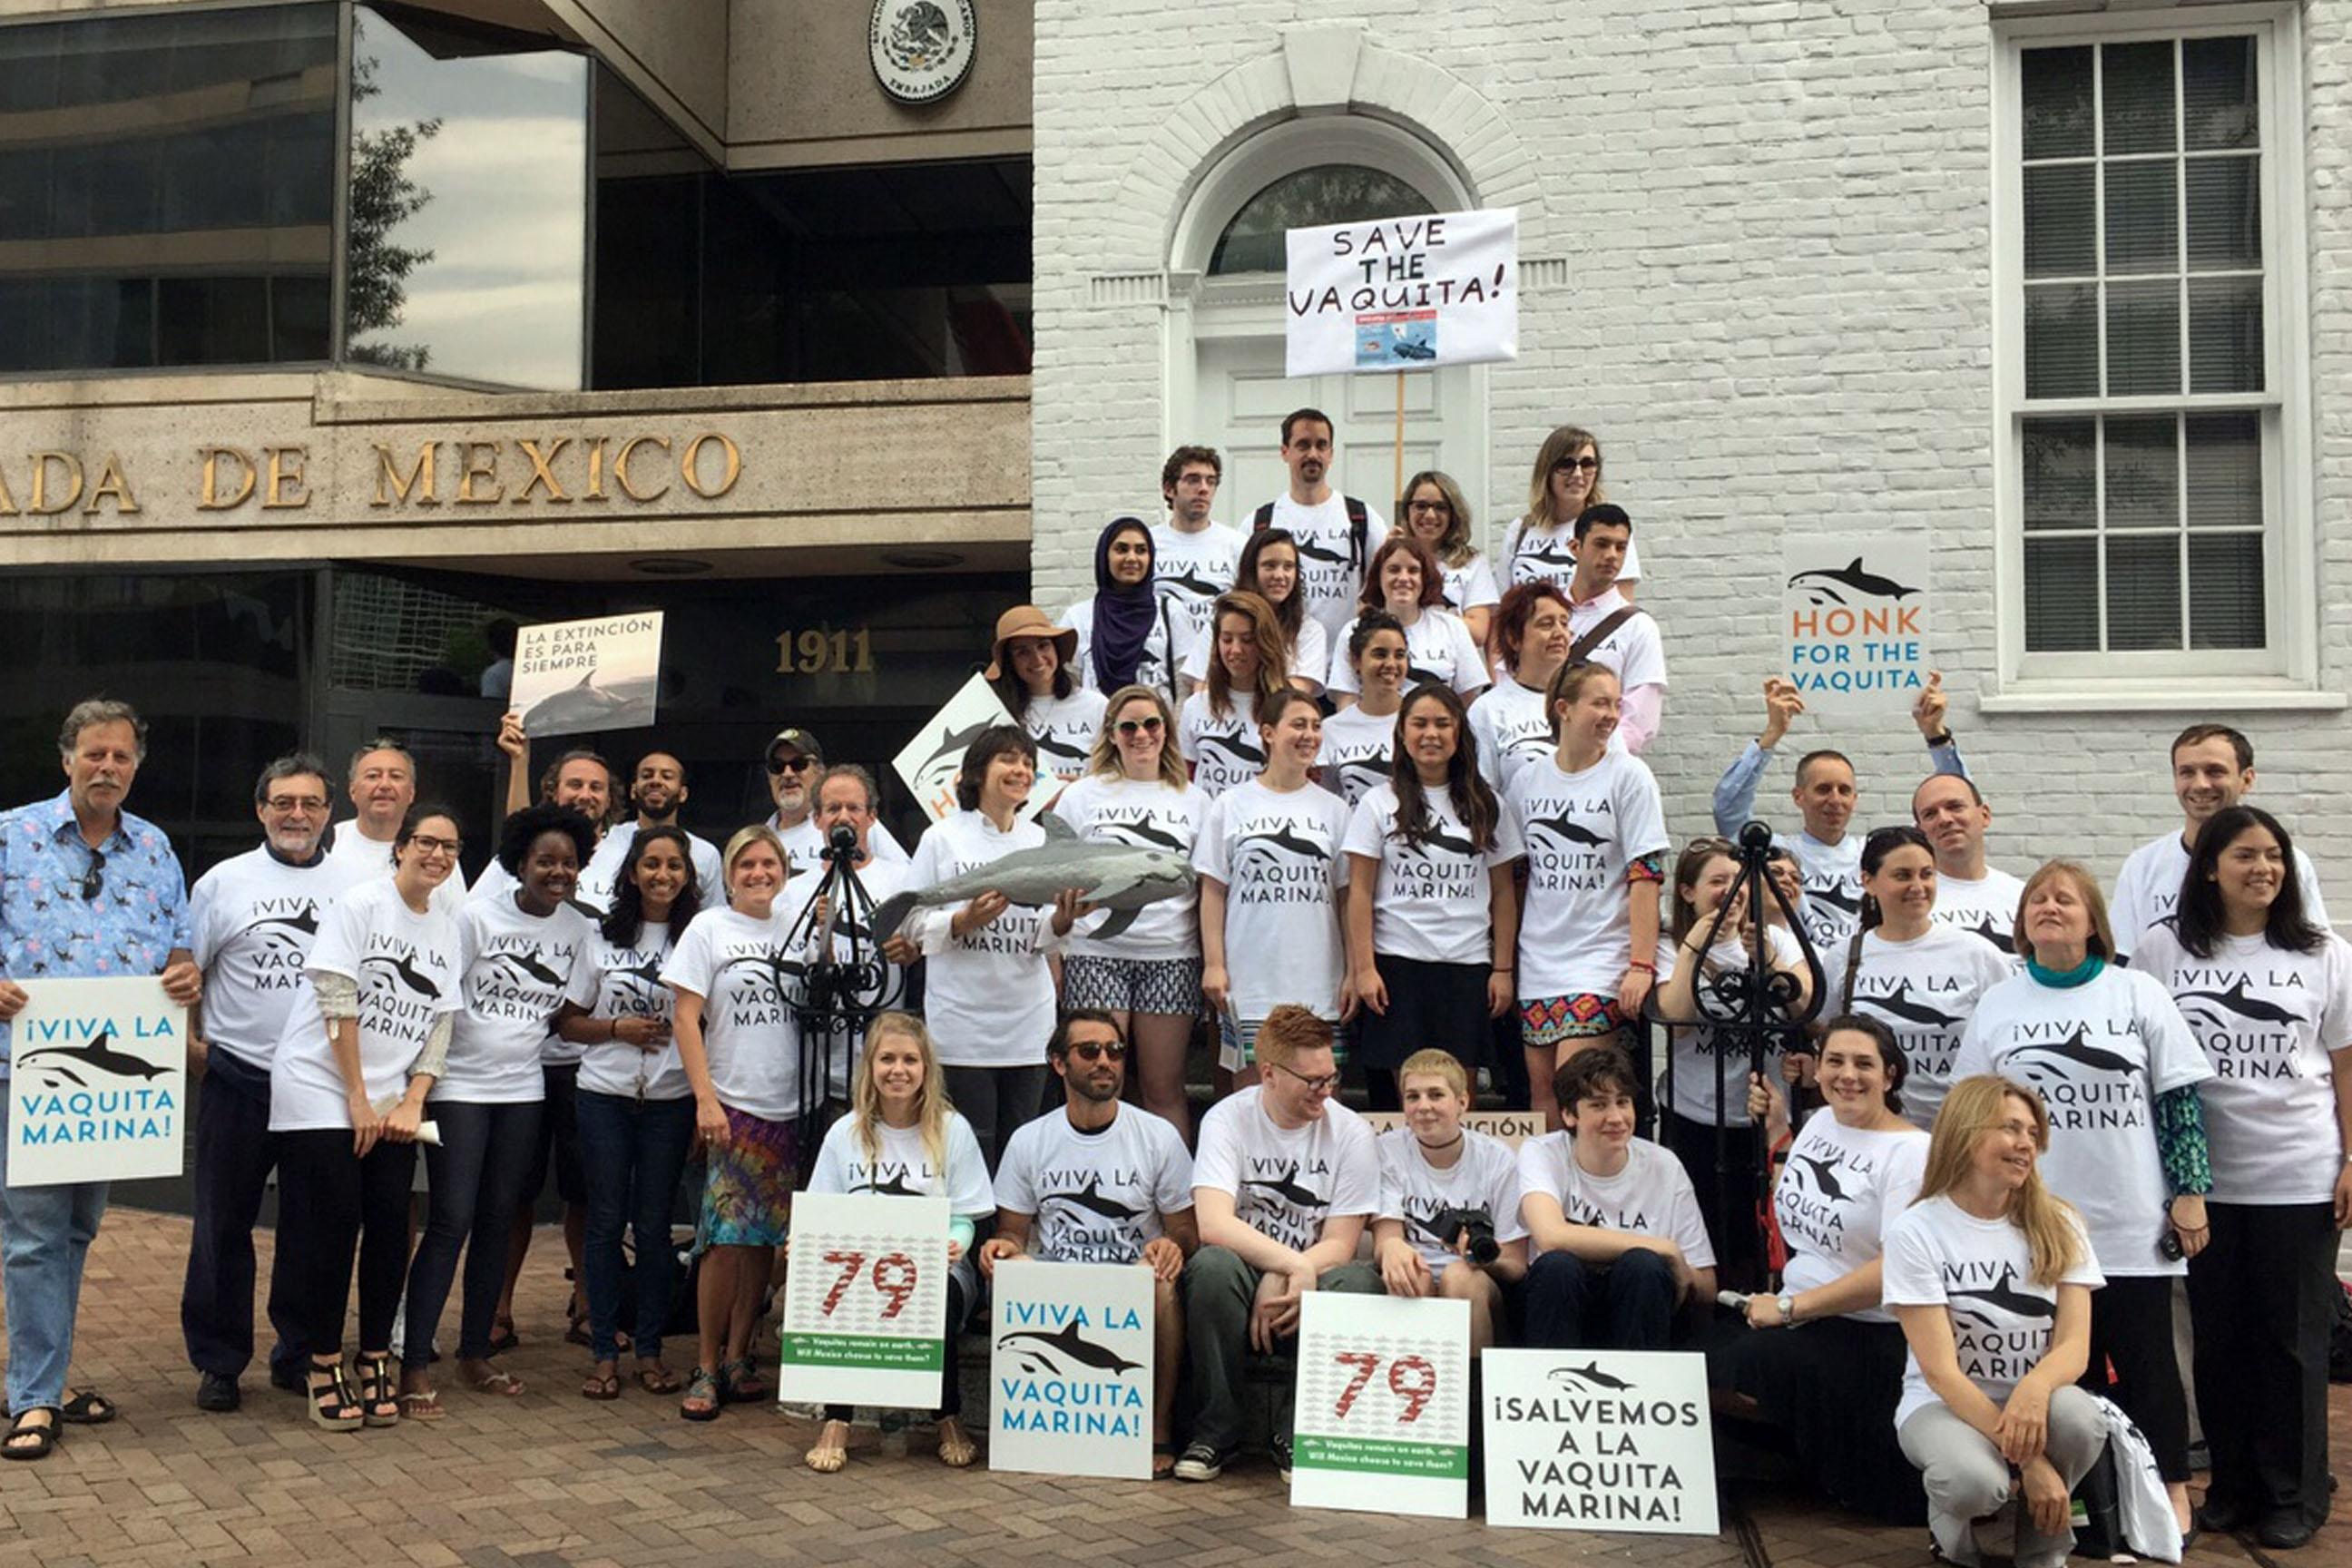 Reconocen ONGs trabaja de México para conservar vaquita marina.